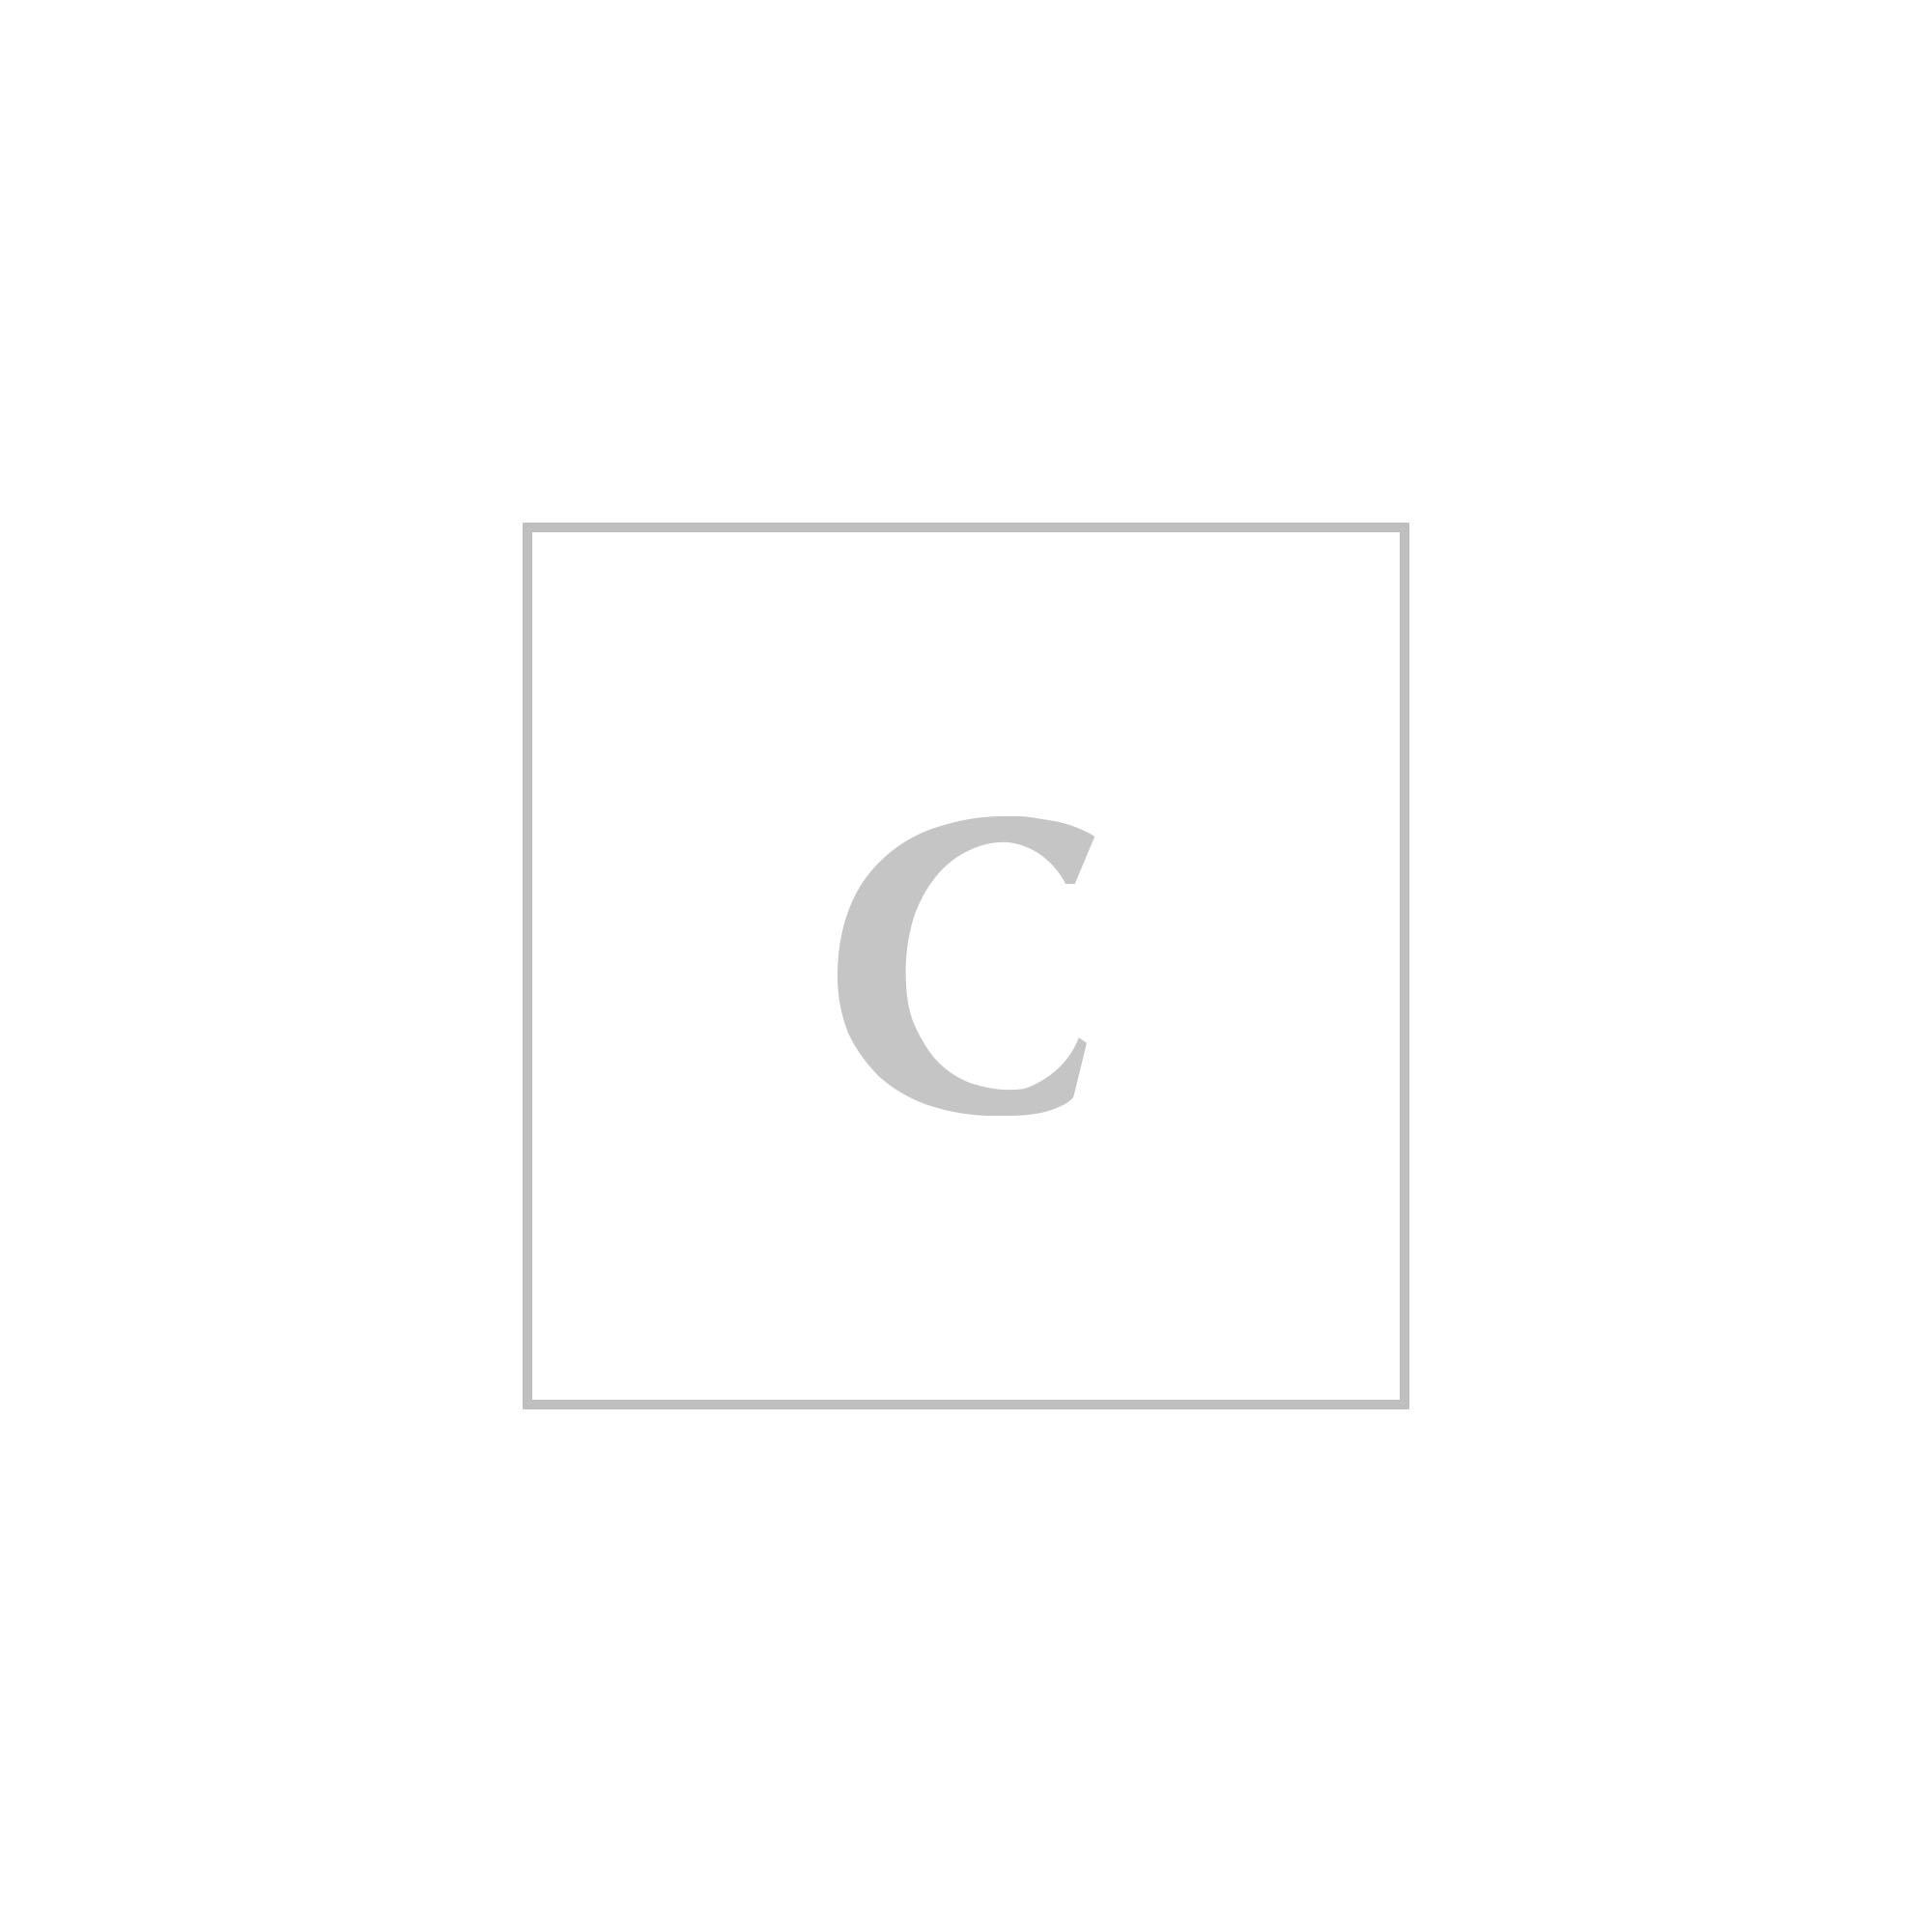 Saint laurent ysl small cabas monogram bag